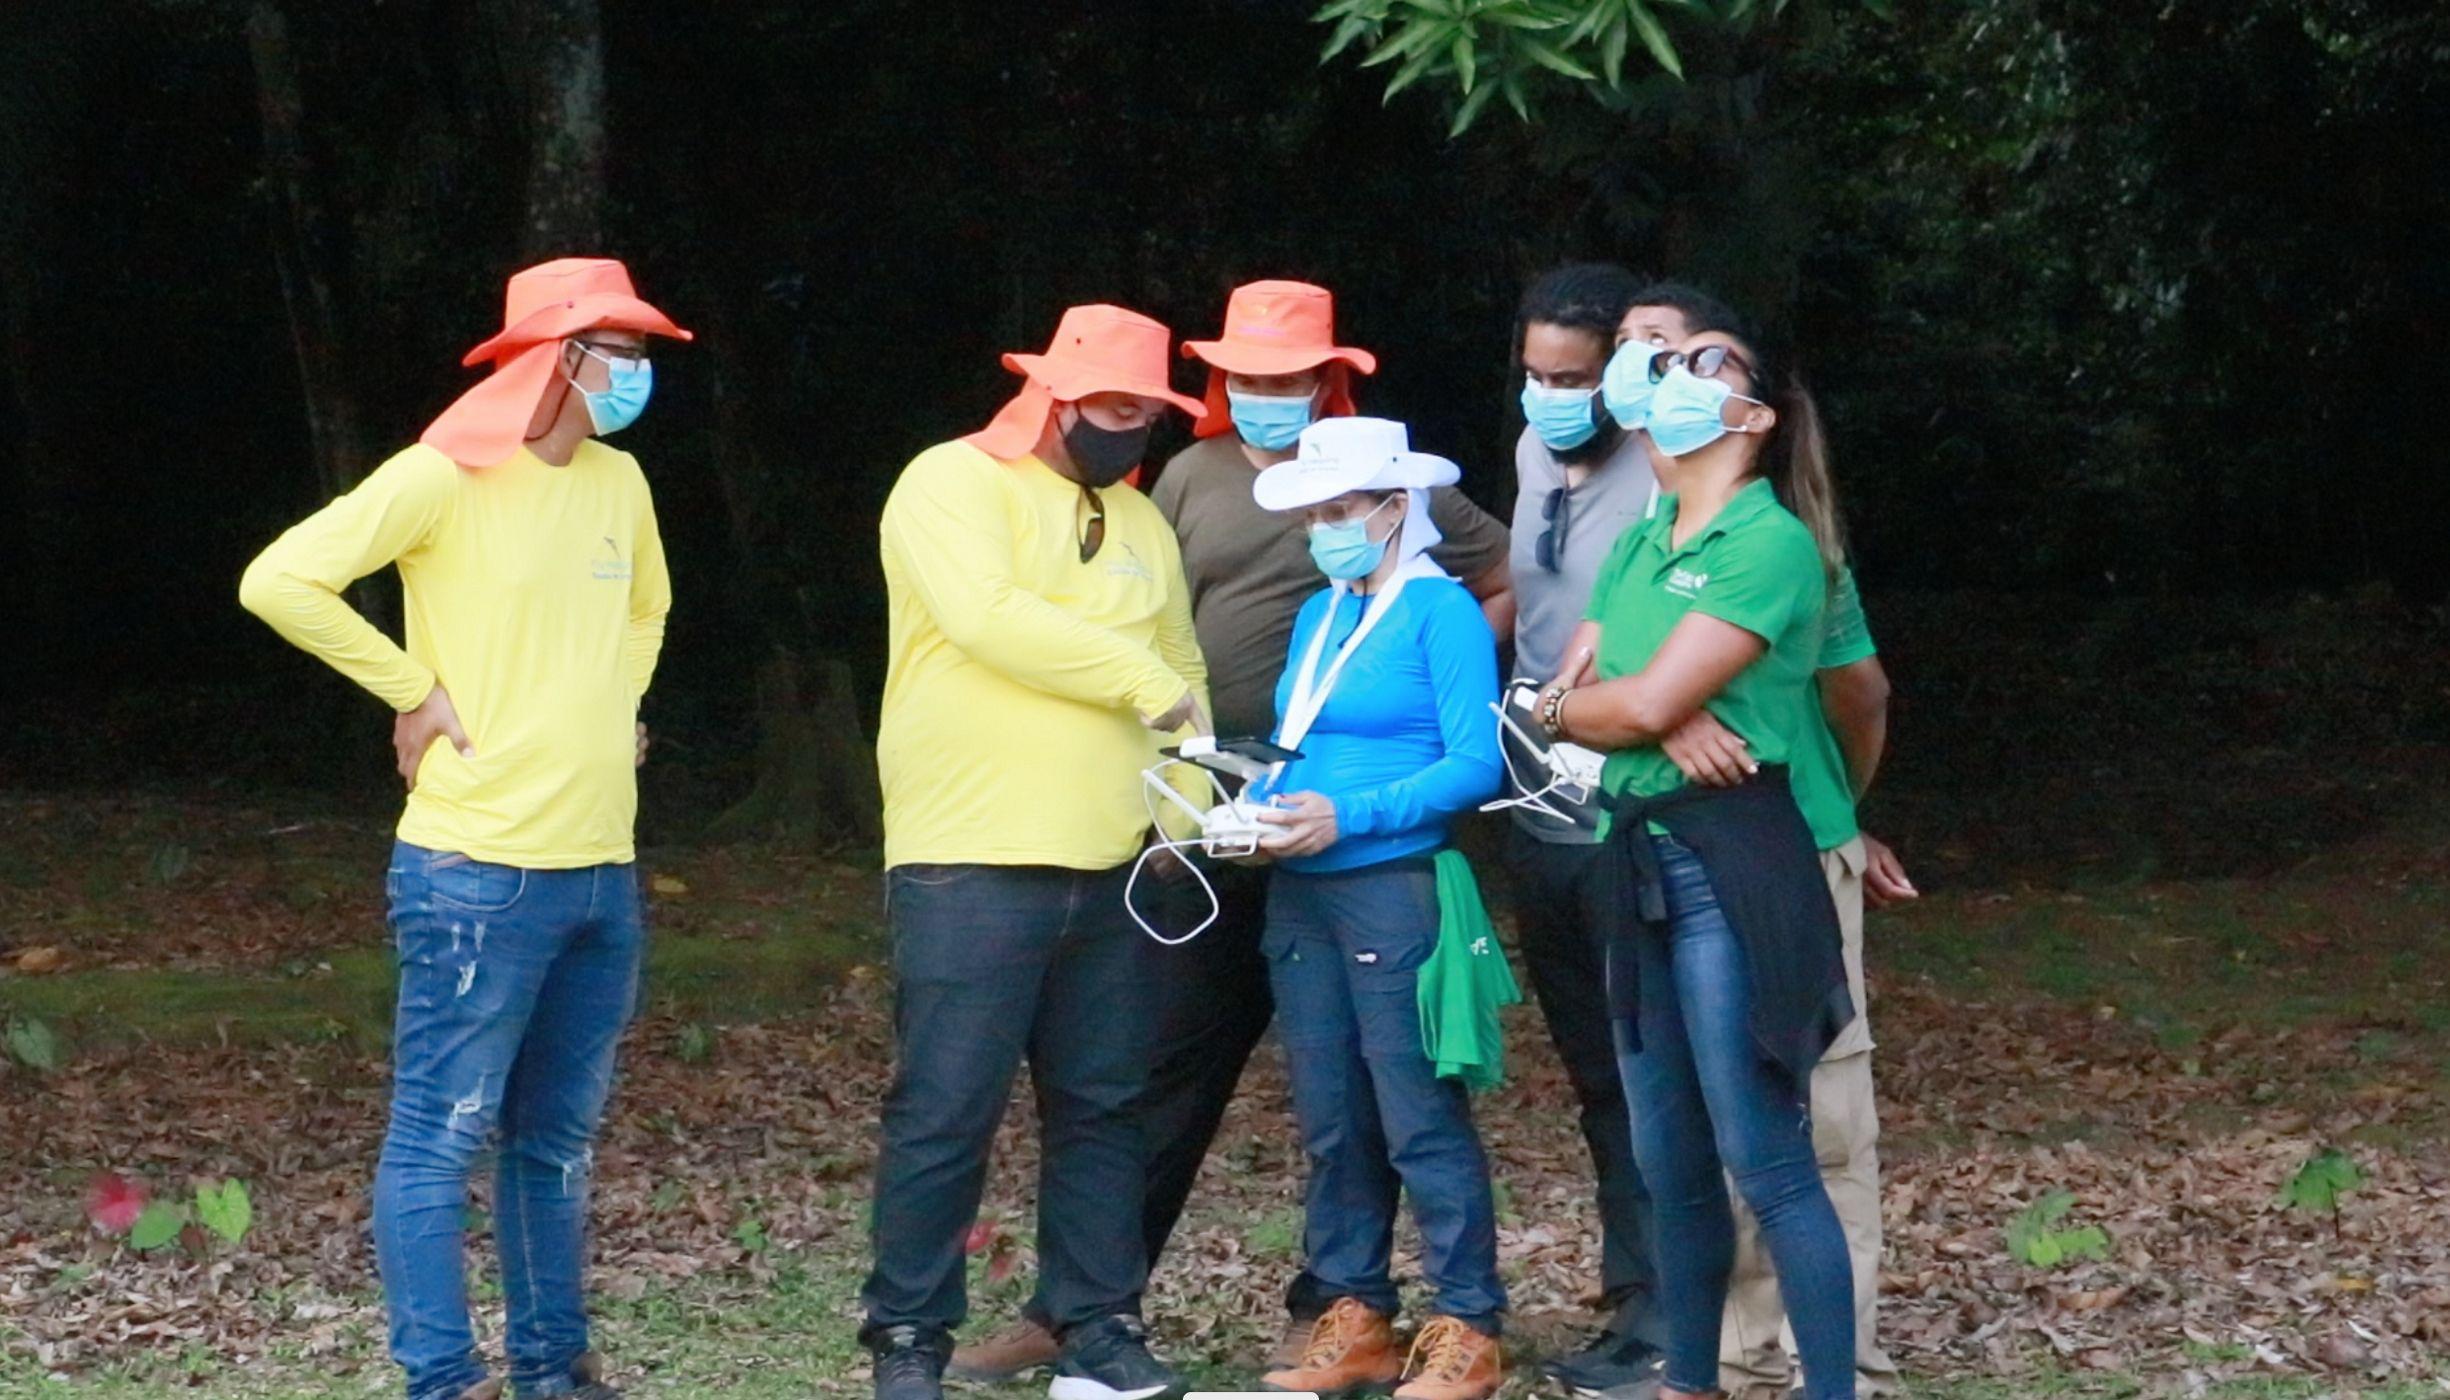 Alunos durante o curso de pilotagem de drones